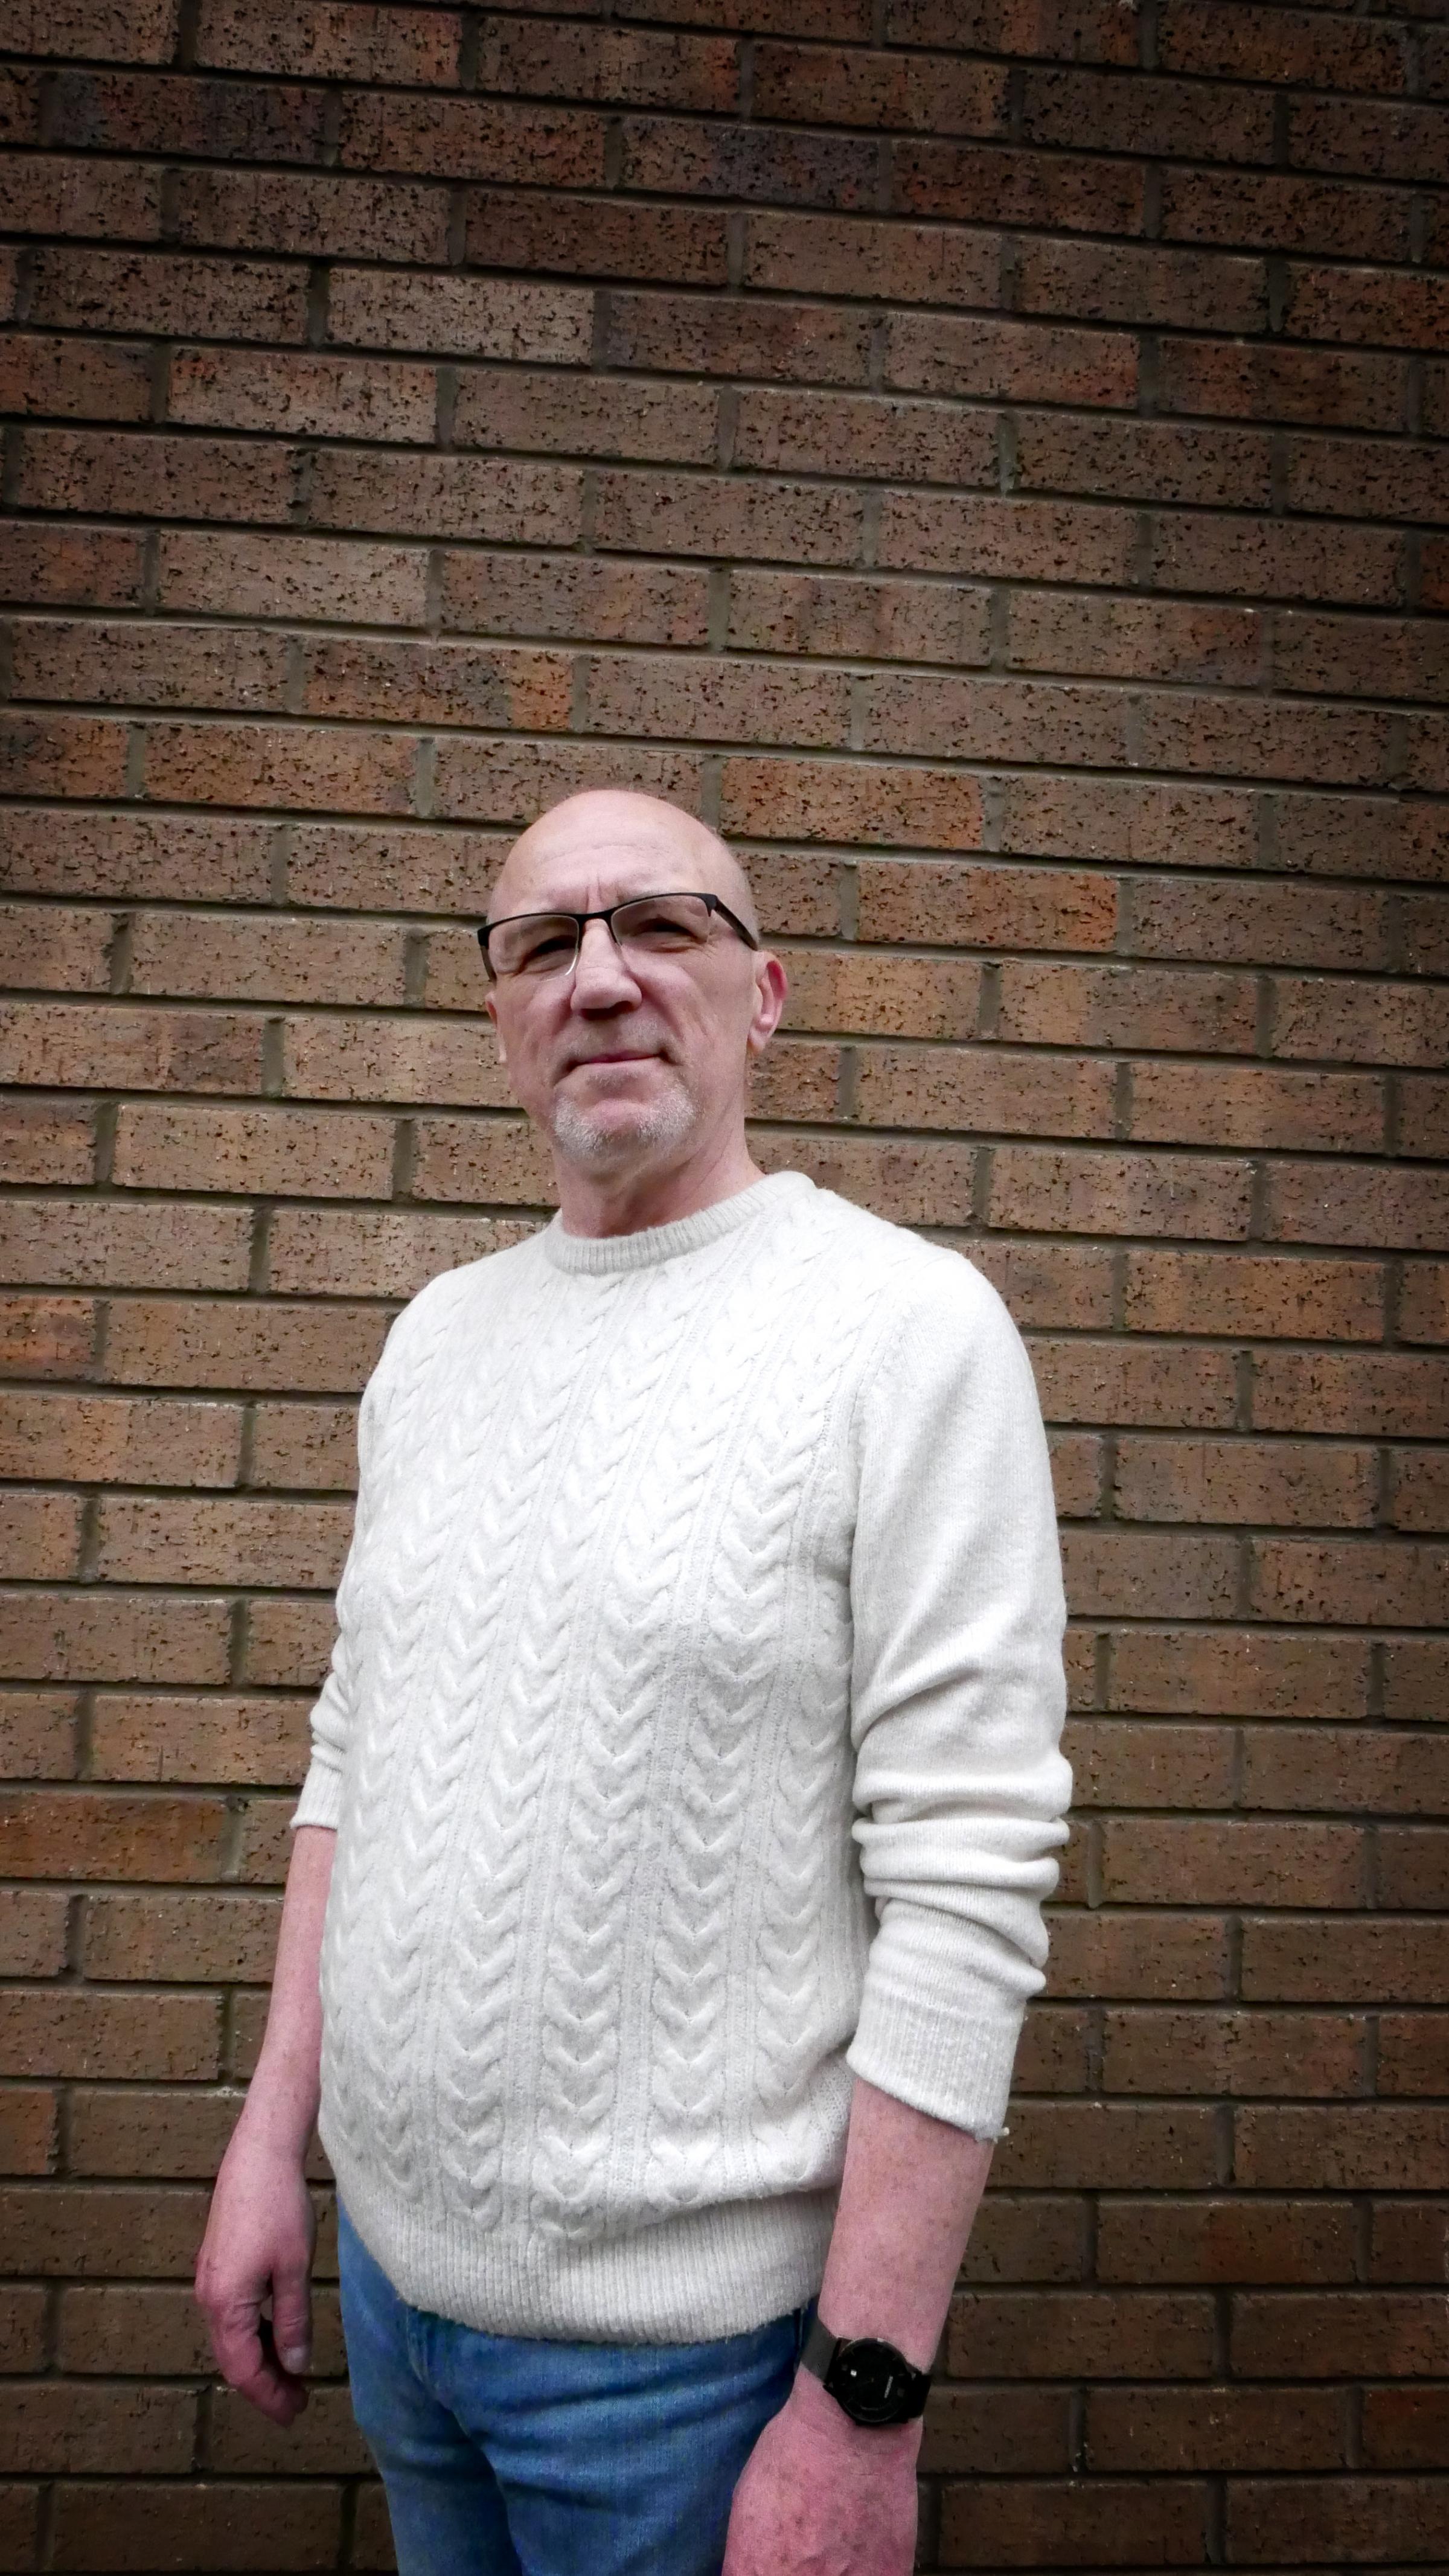 Paul McCay has been volunteering at a befriending service